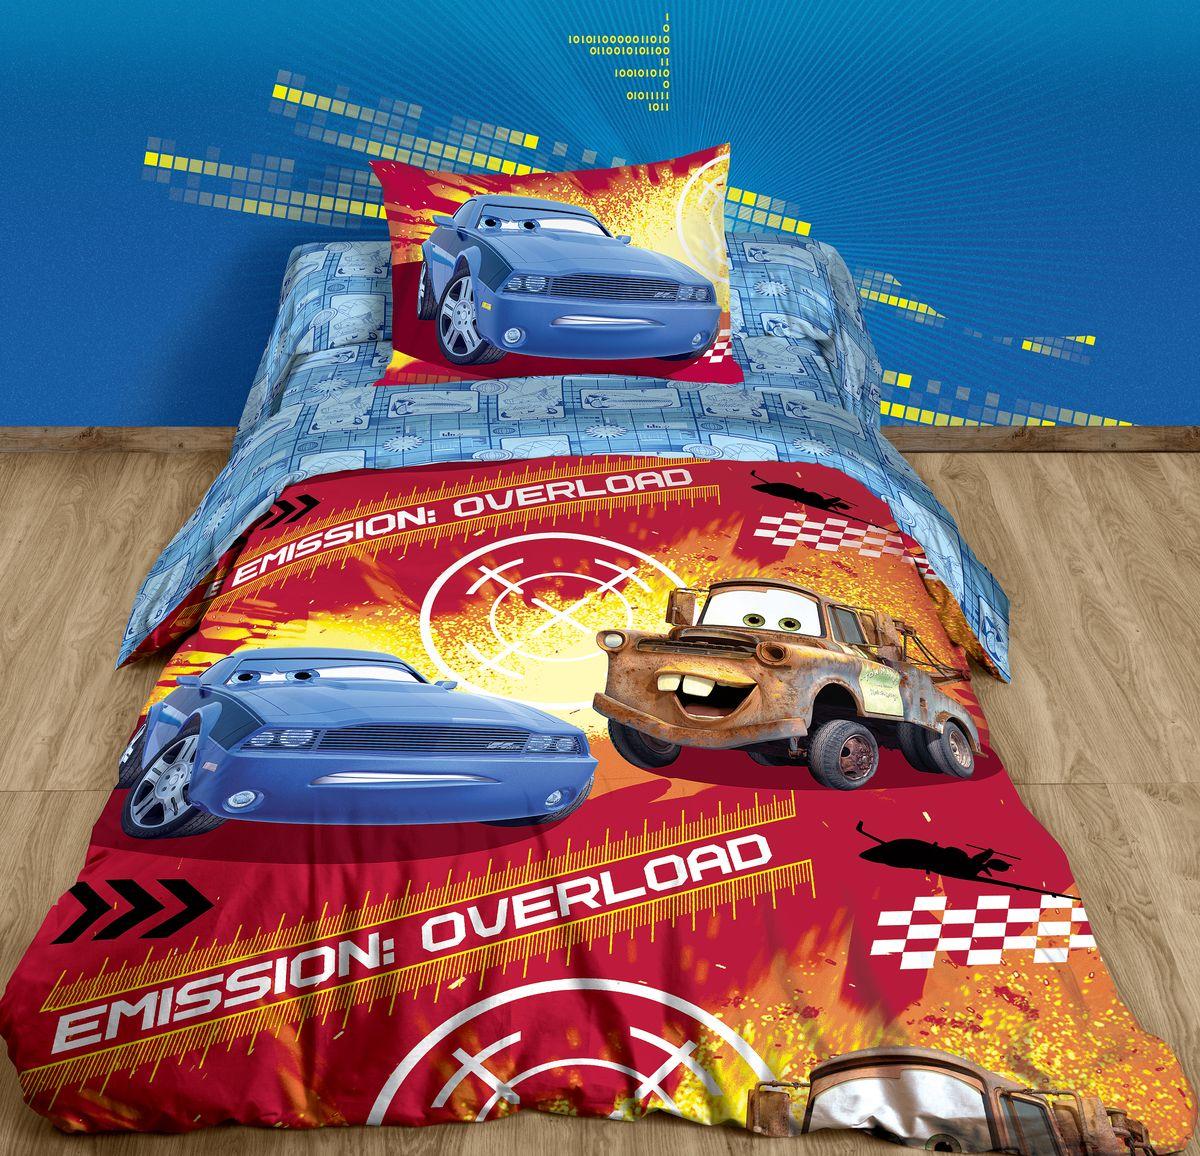 Комплект белья Disney, 1,5-спальный, наволочка 50х70, цвет: красный + ПОДАРОК: Наволочка Disney Тачки, 50 х 70 см7183531 простынь 1480х2150мм,1 пододеяльник 1480х2100мм, 1 наволочка 500х700мм + Подарок 1 наволочка 500х700мм